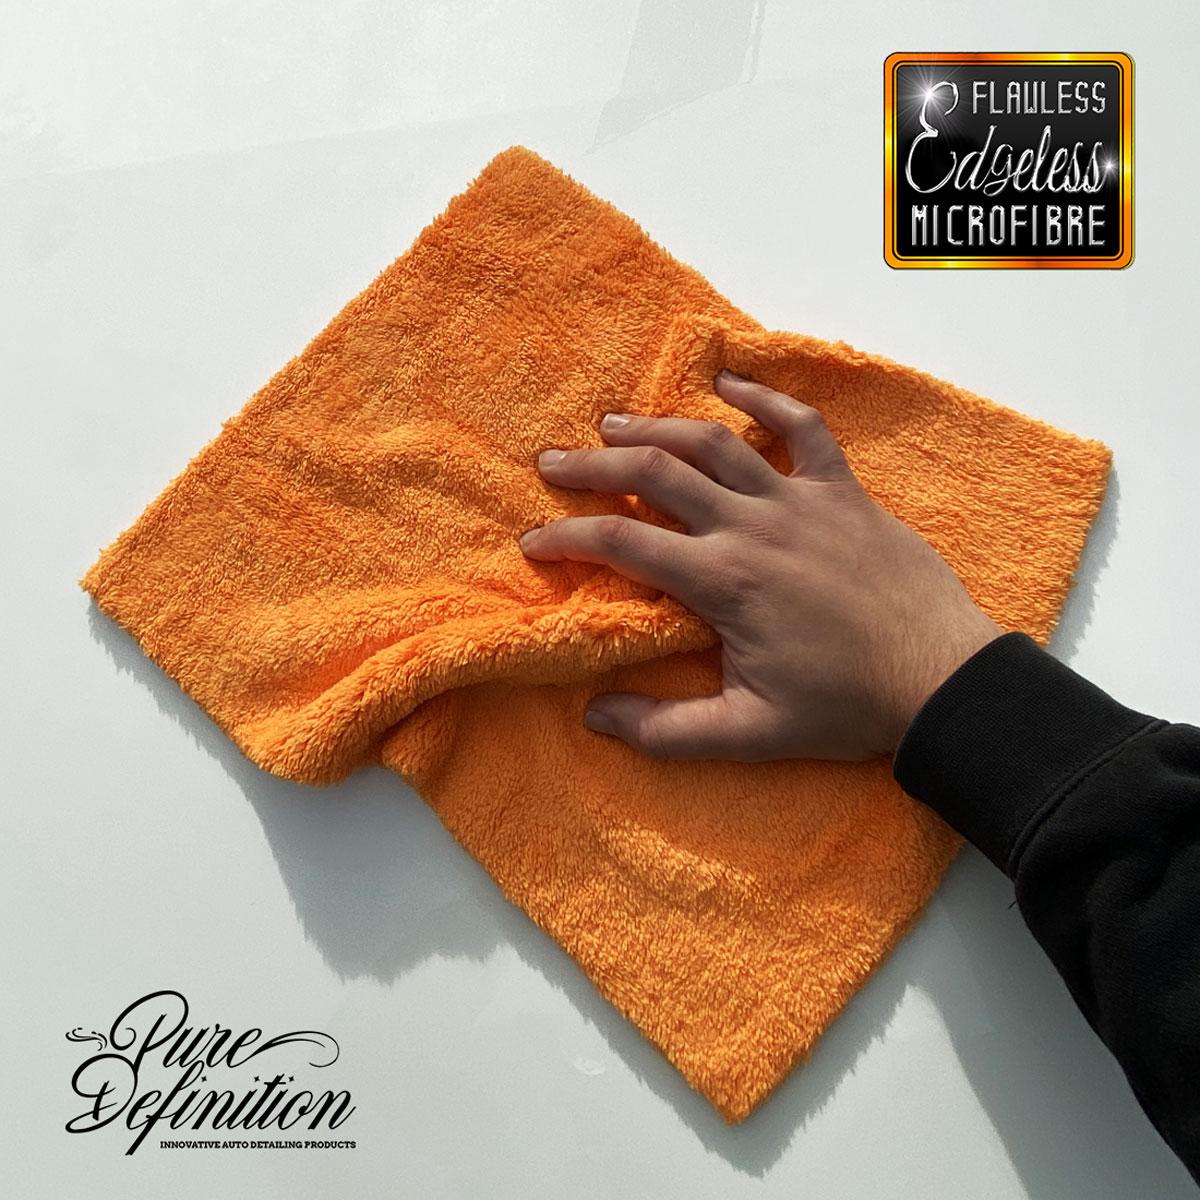 flawless edgeless orange cloth in use.jpg